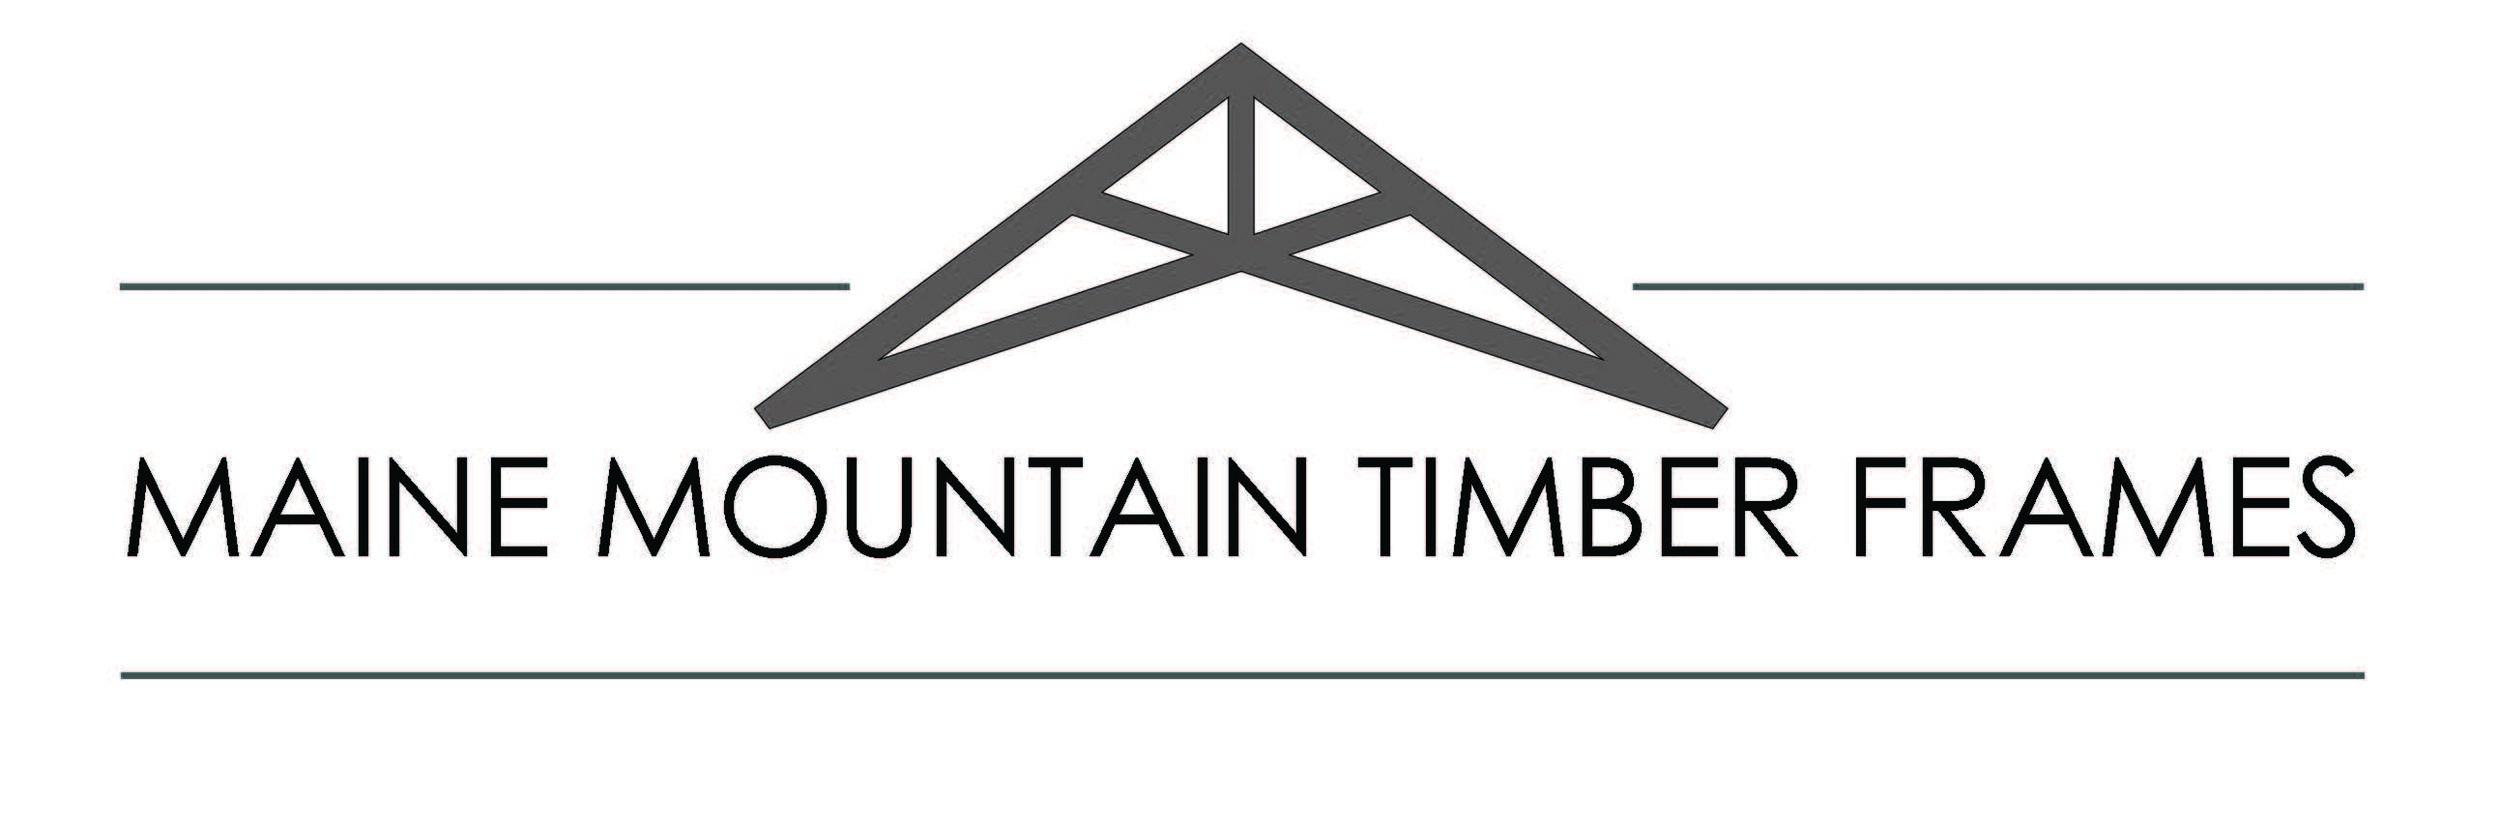 Maine Mountain Timber Frames.jpg